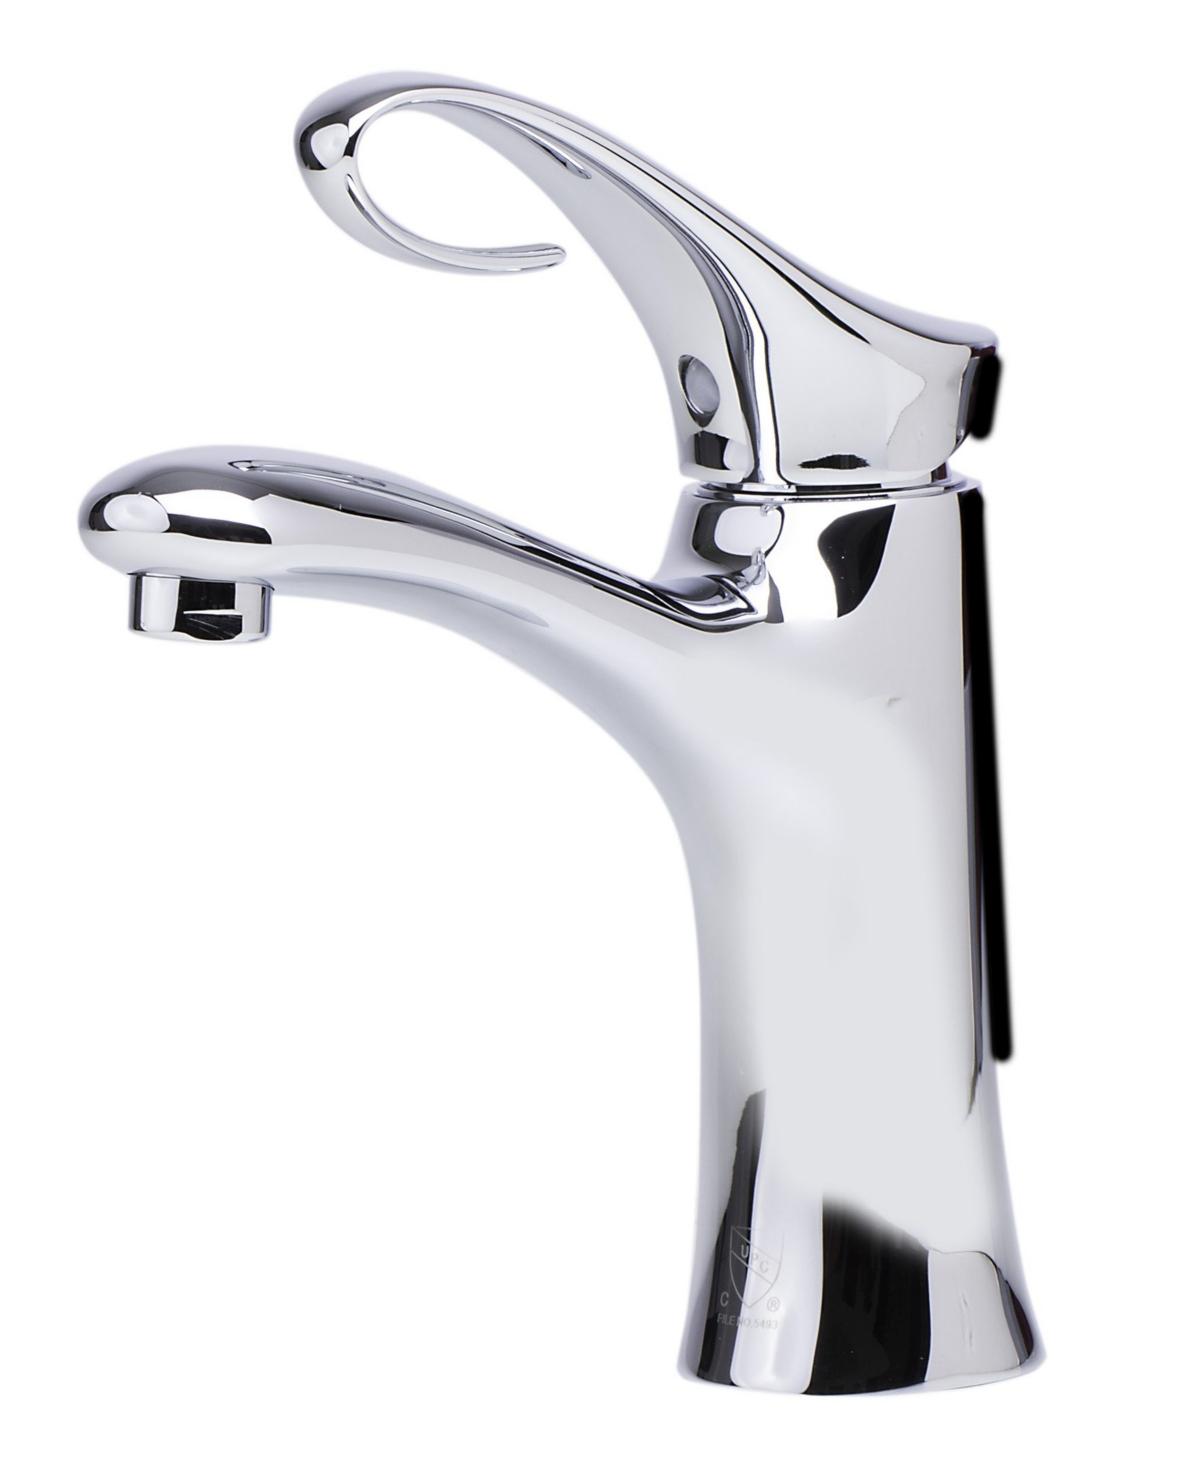 Alfi brand Polished Chrome Single Lever Bathroom Faucet Bedding